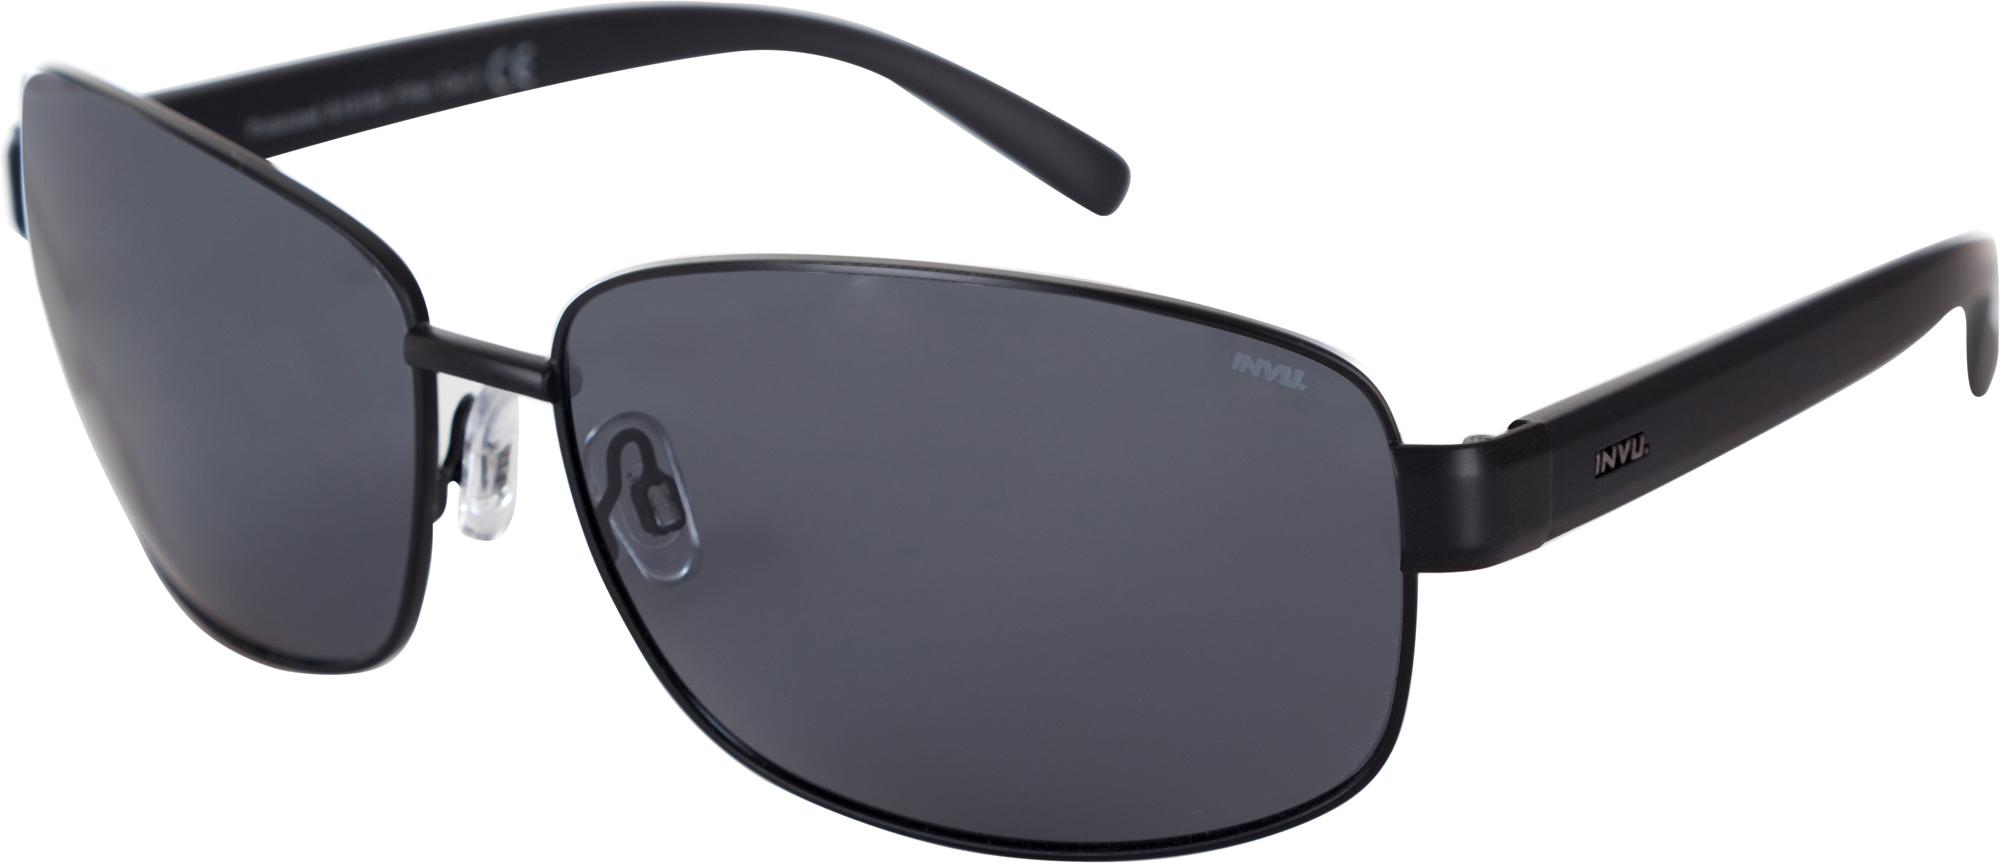 Invu Солнцезащитные очки мужские Invu солнцезащитные очки tehmoda очки tm0025 g 6 sk skateboard